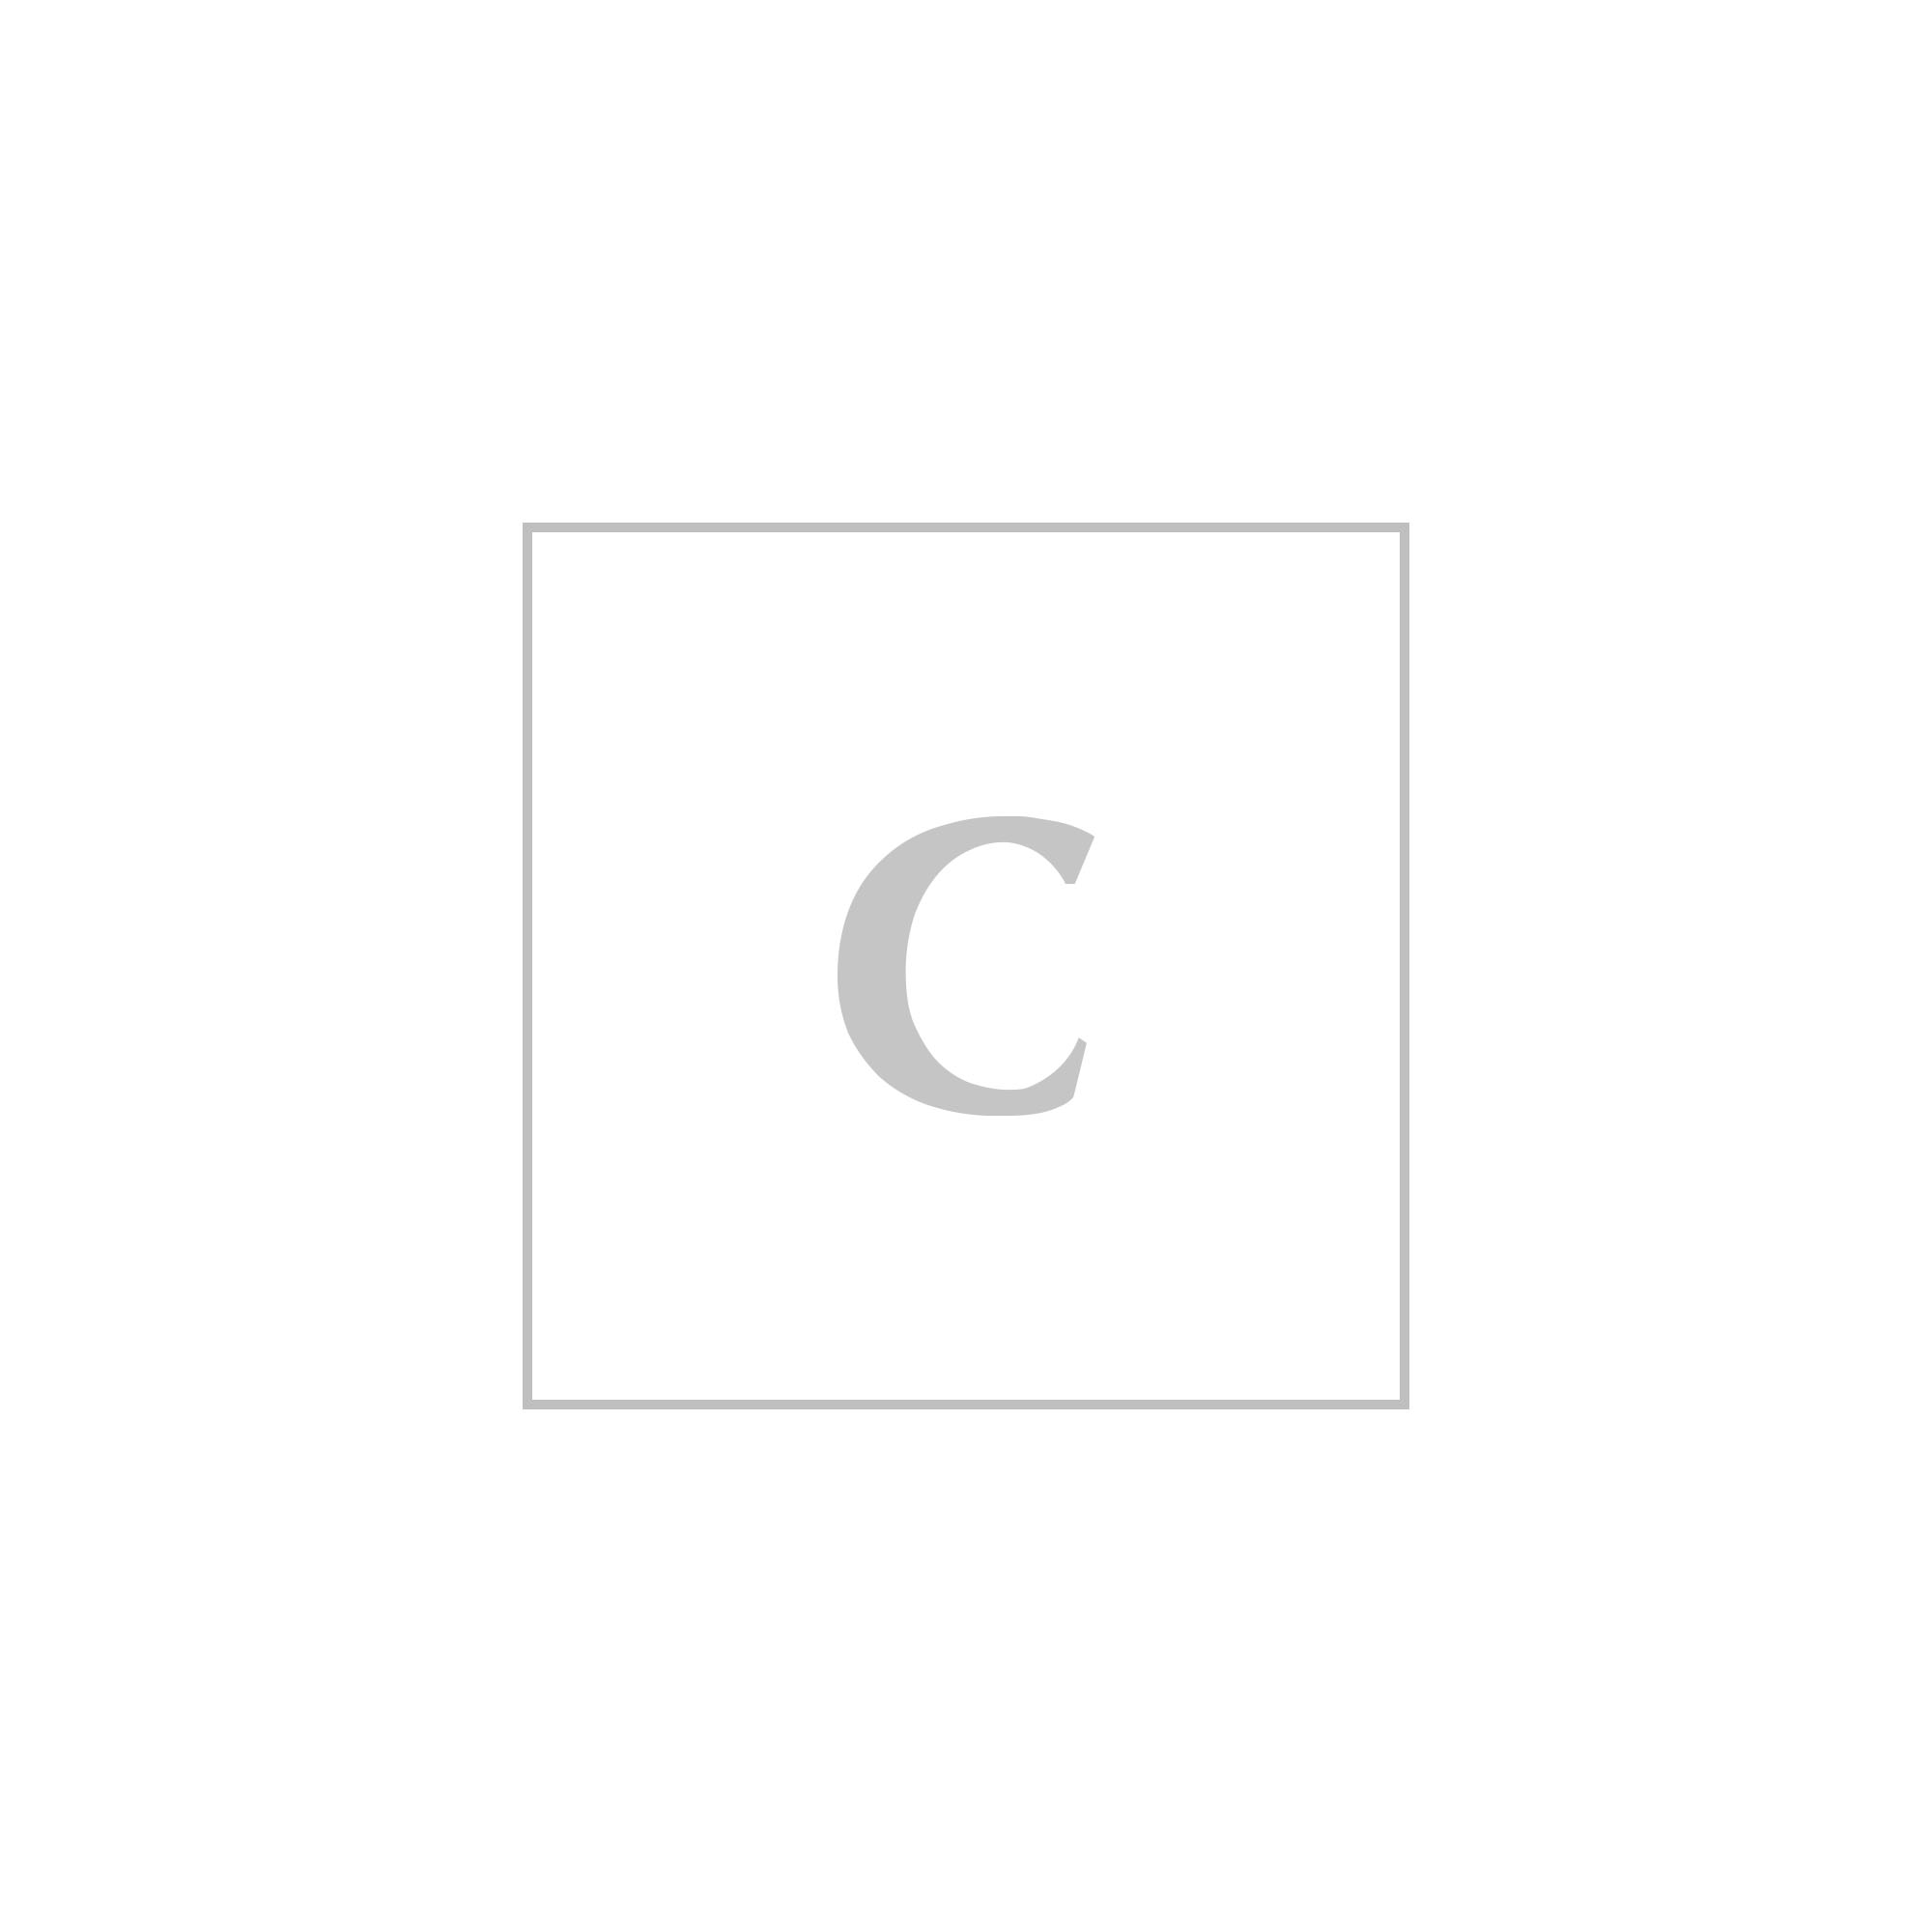 Saint laurent ysl monogram grain leather wallet